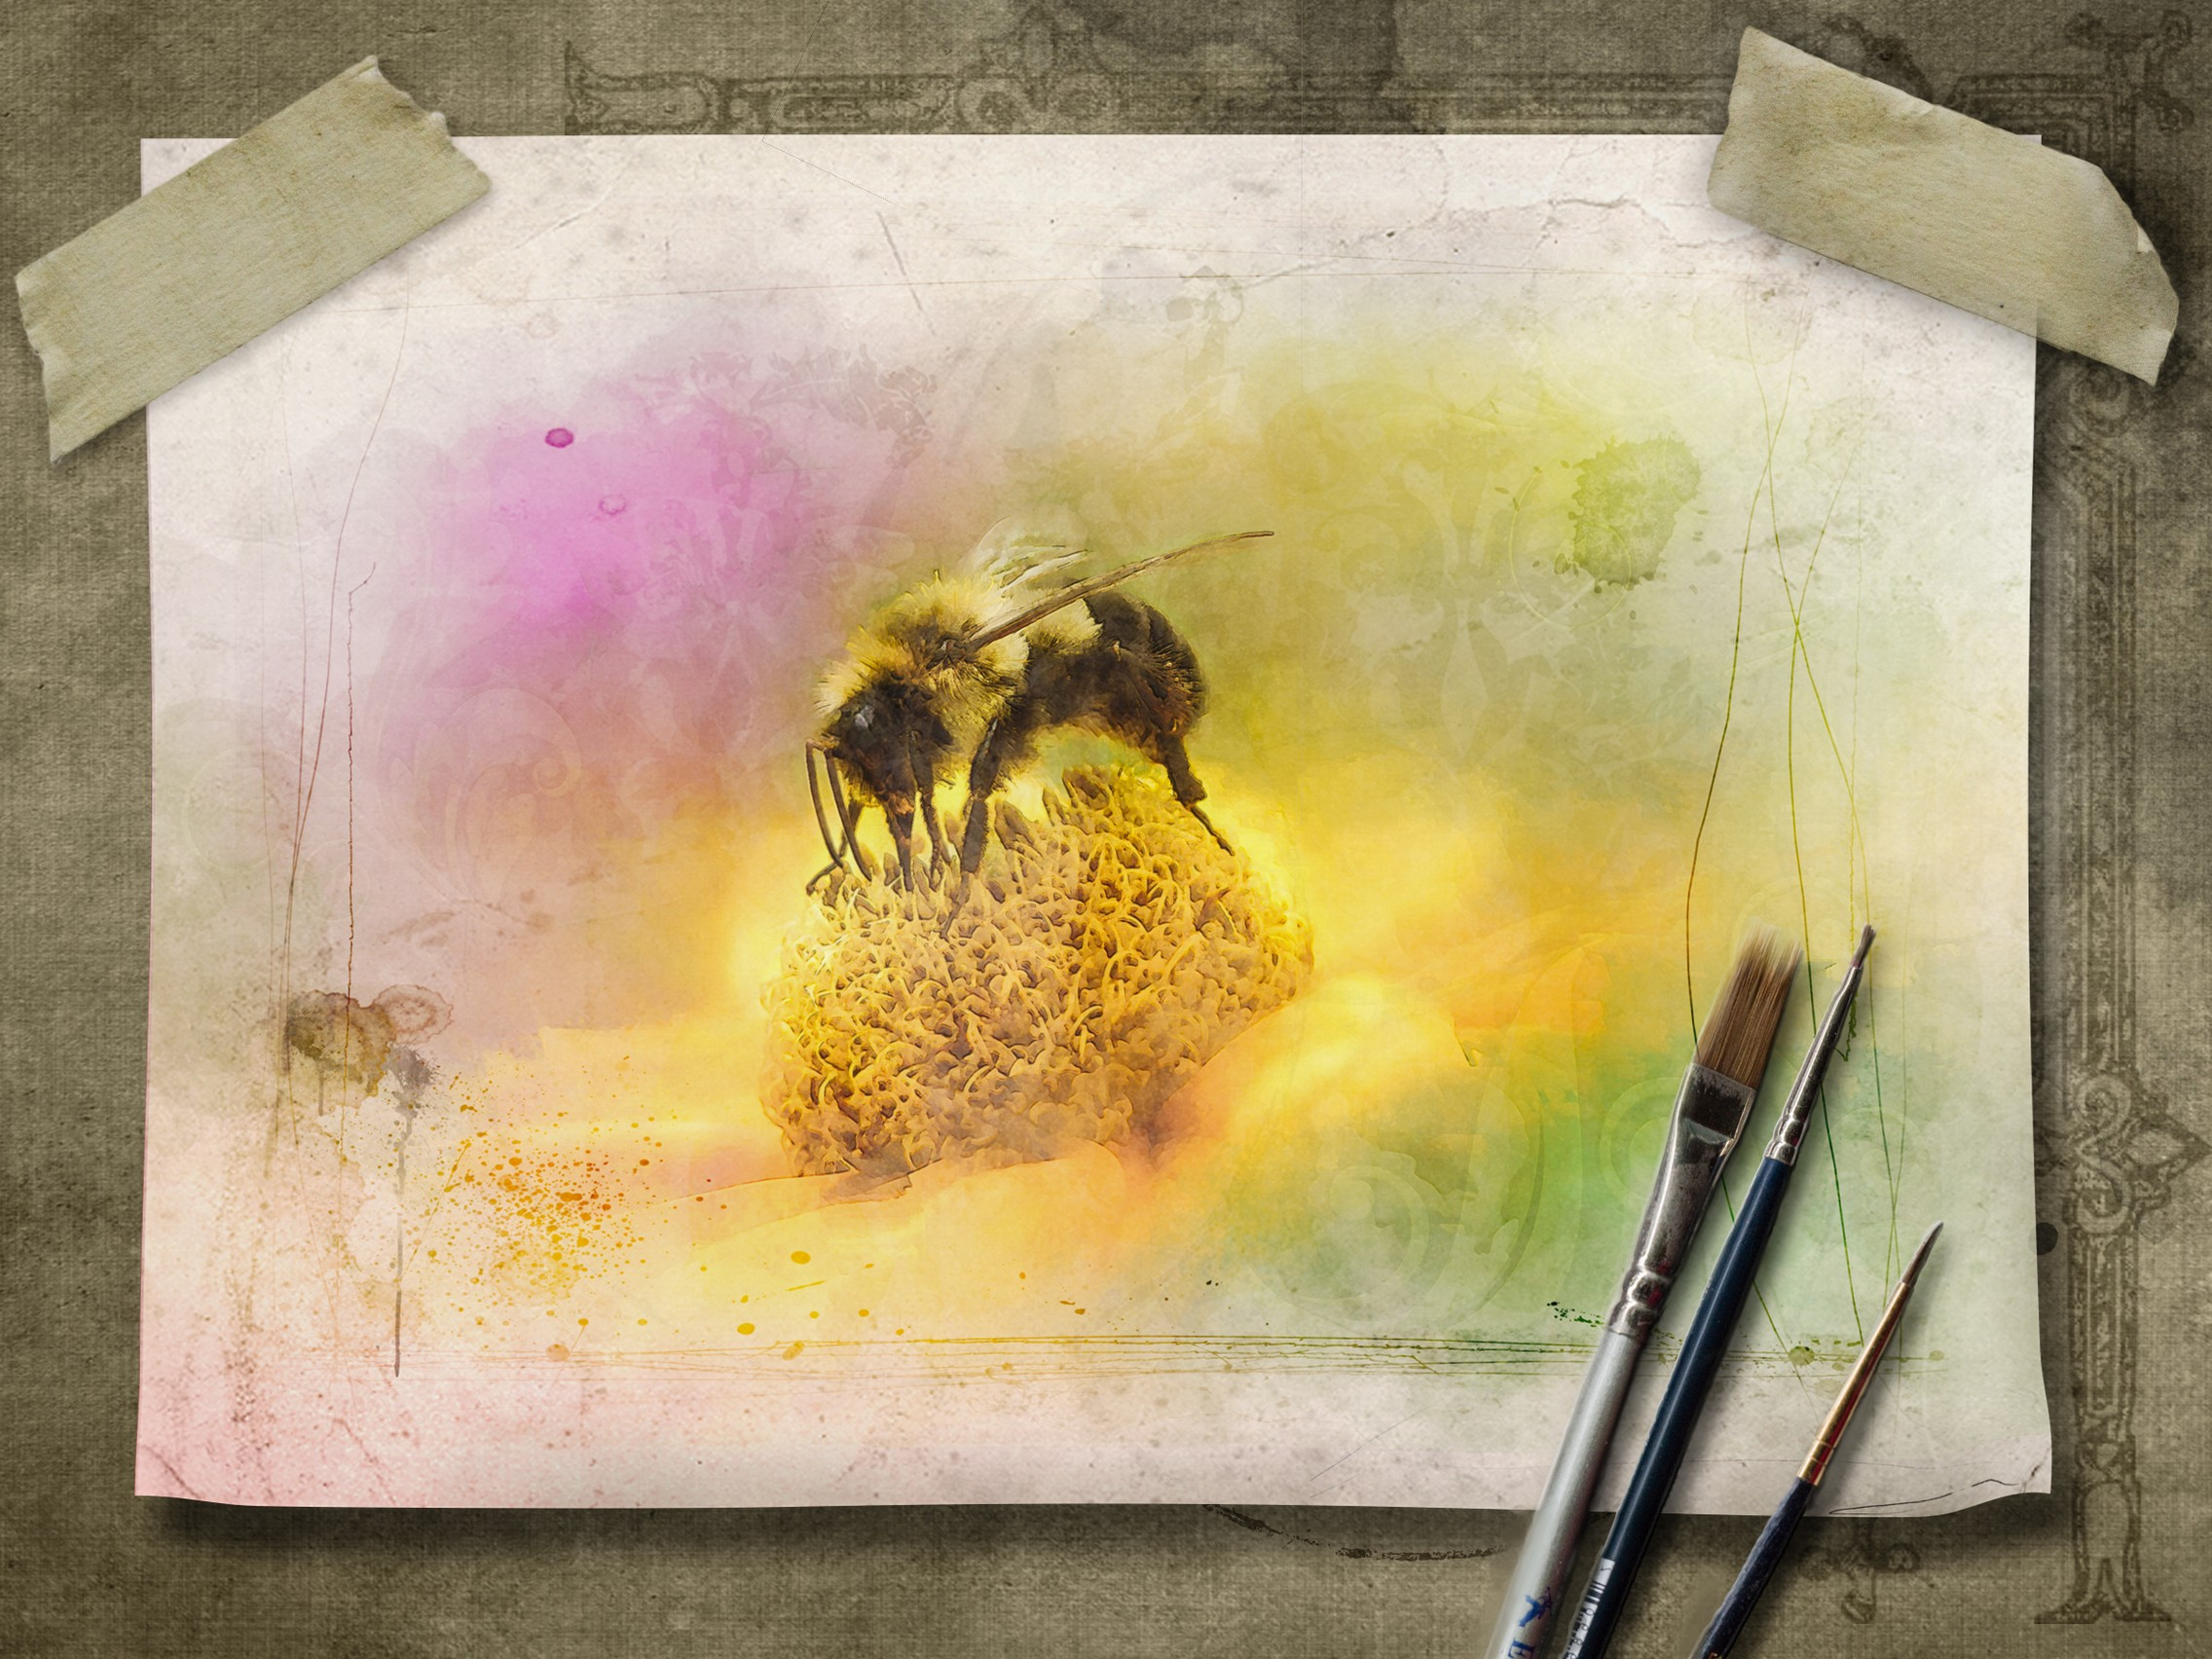 watercolor-bee-brushes-sm.jpg